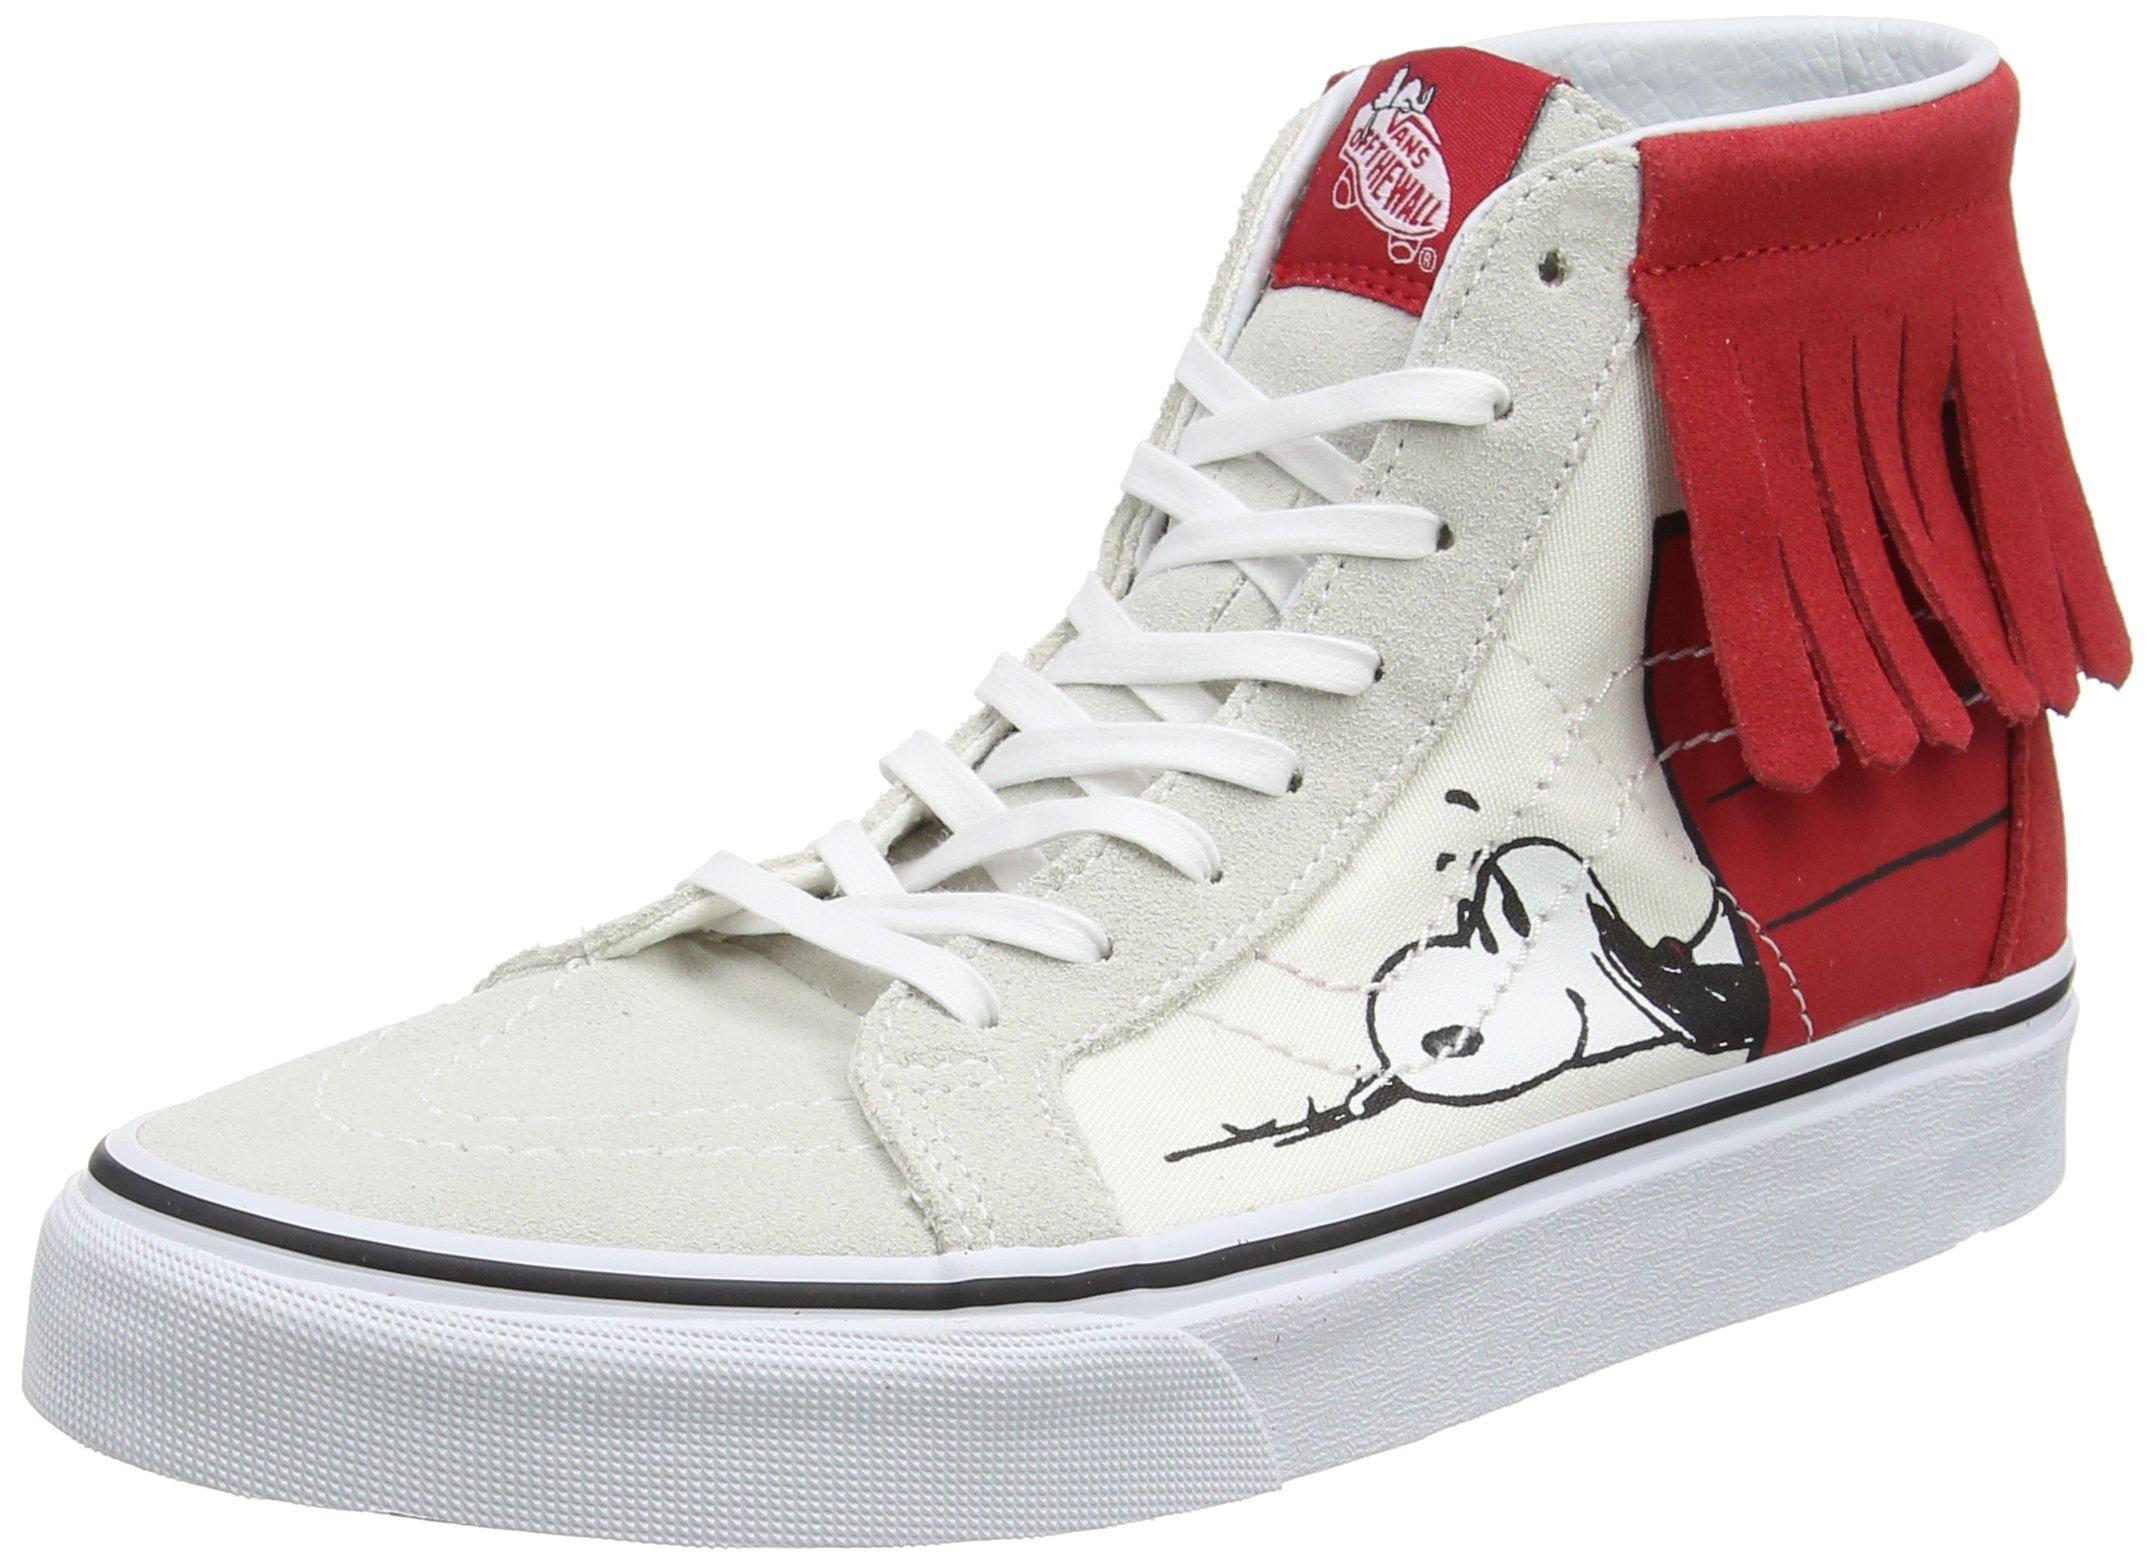 Vans SK8-Hi Moc (Peanuts) Dog House/Bone Women's Skate Shoes Size 9